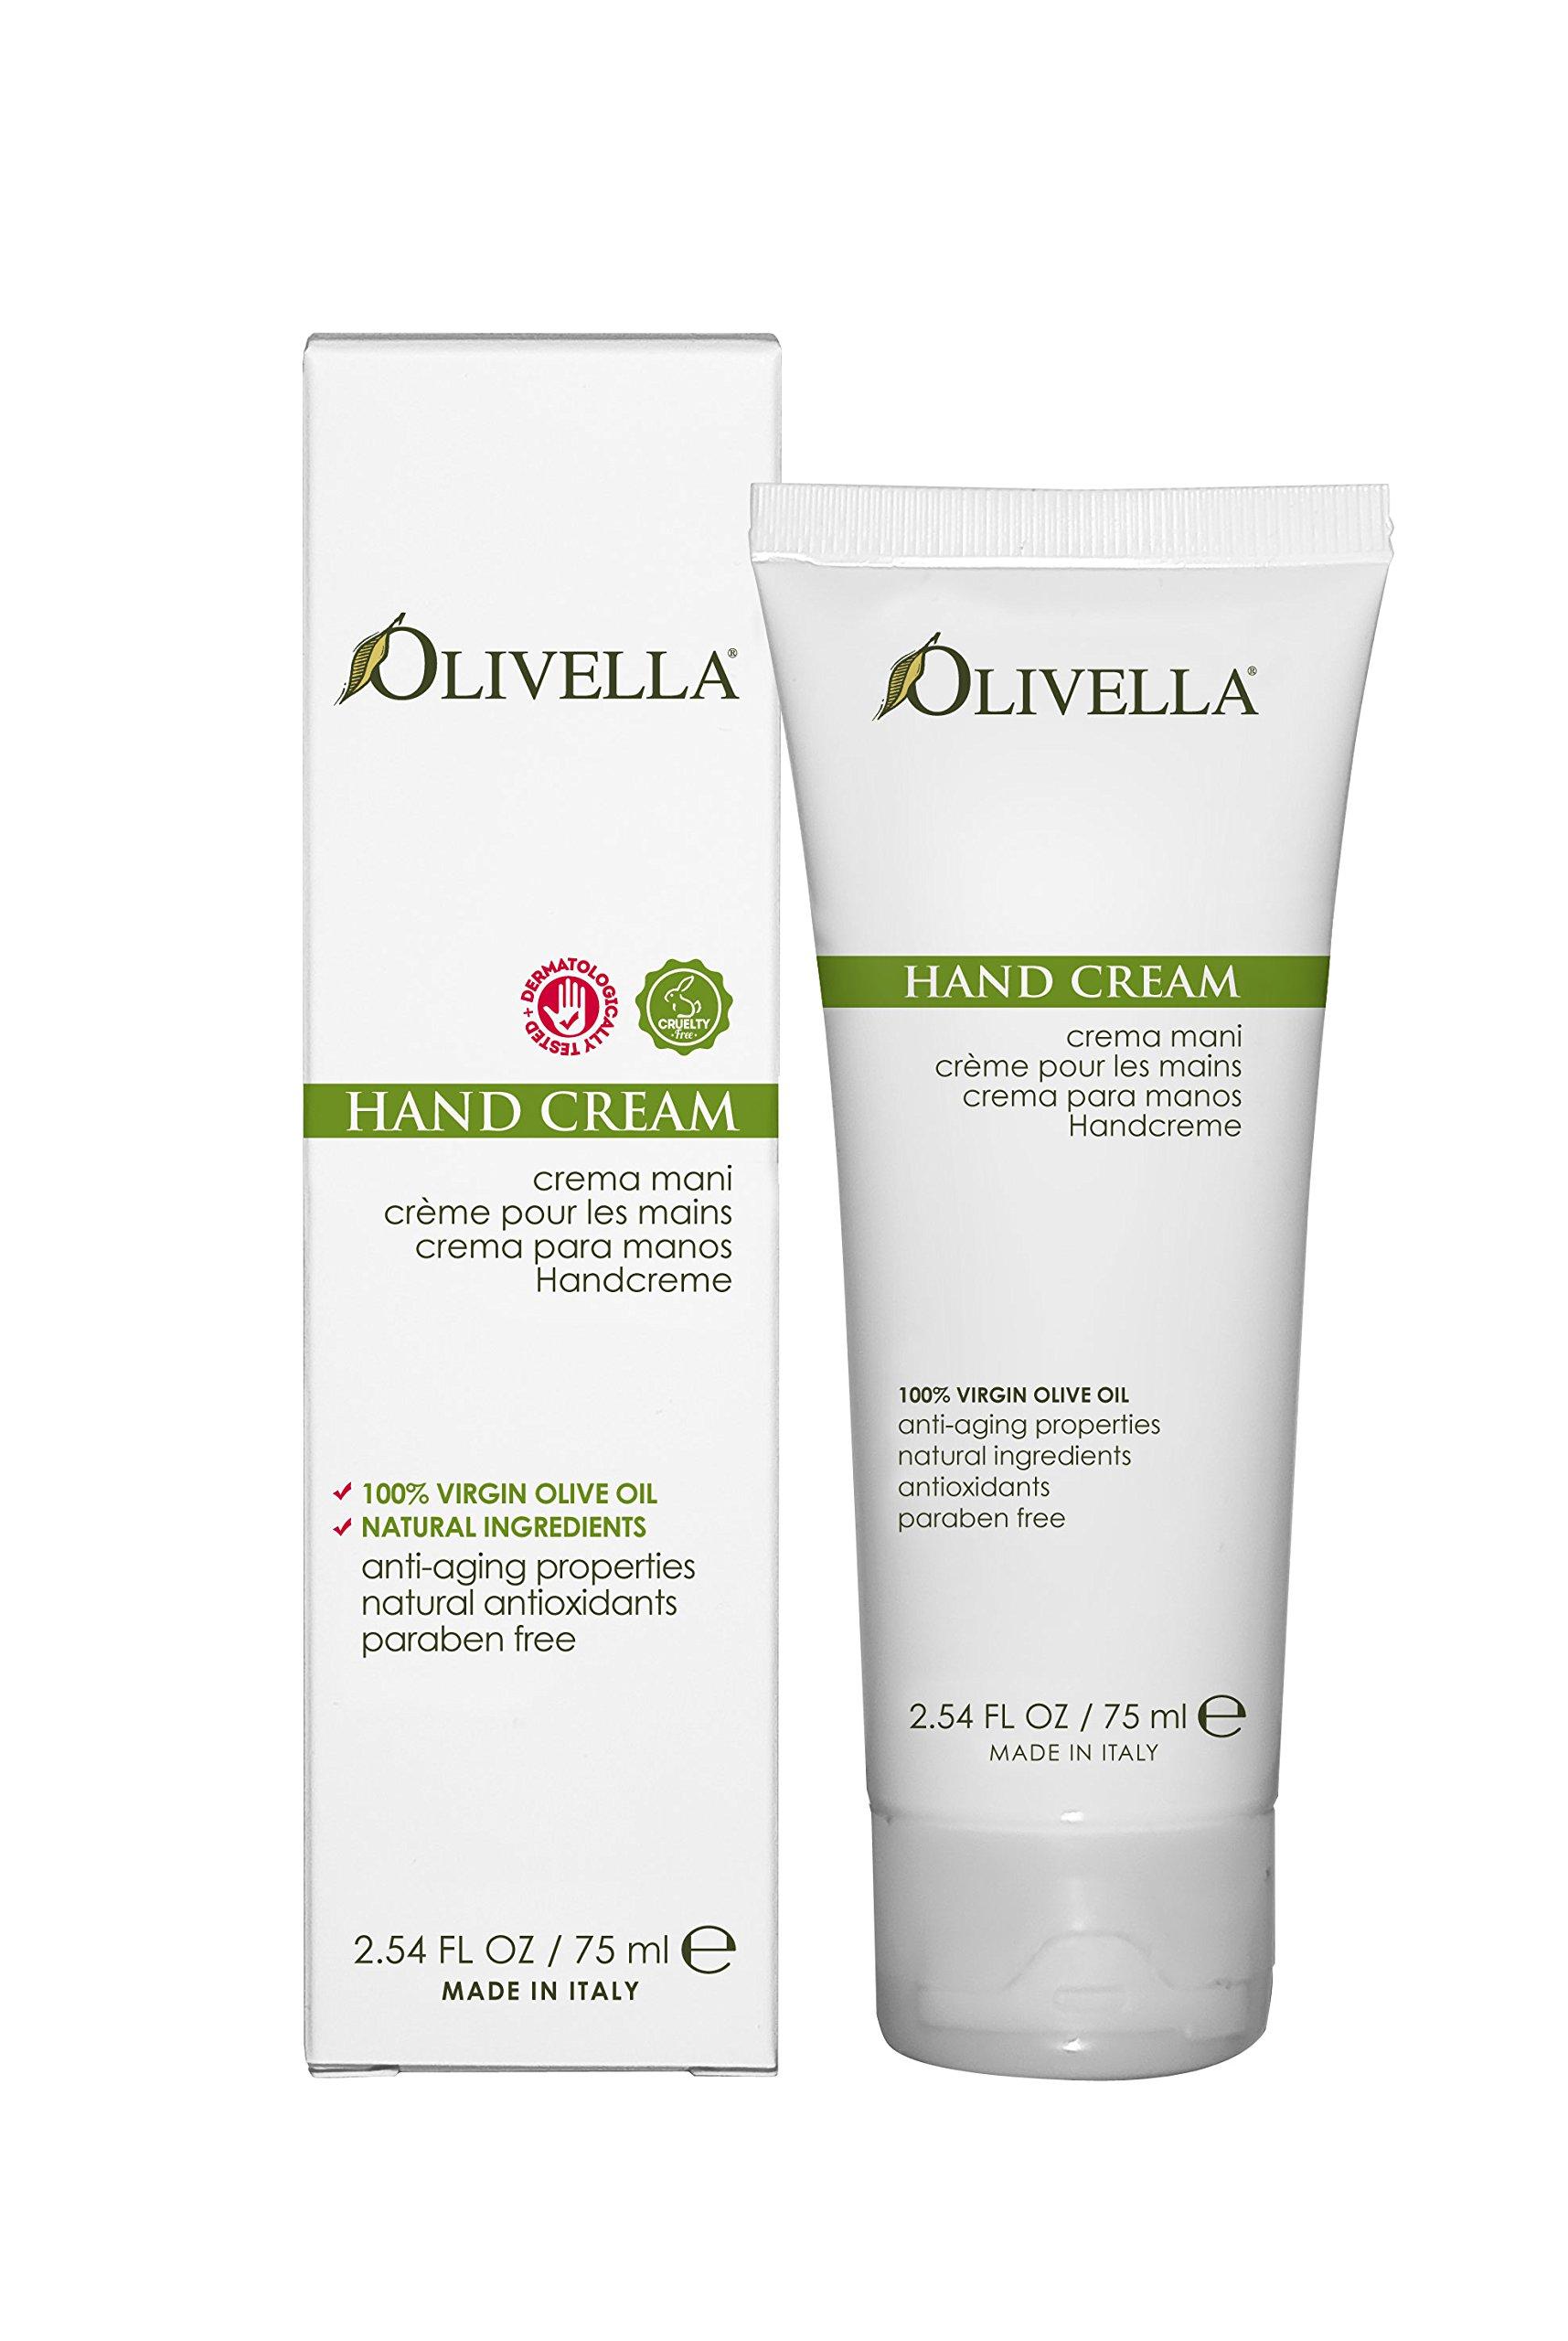 Virgin Olive Oil Moisturizer Cream - 1.69 oz. by Olivella (pack of 2) 4 oz. Banana Lip Balm Flavor Oil